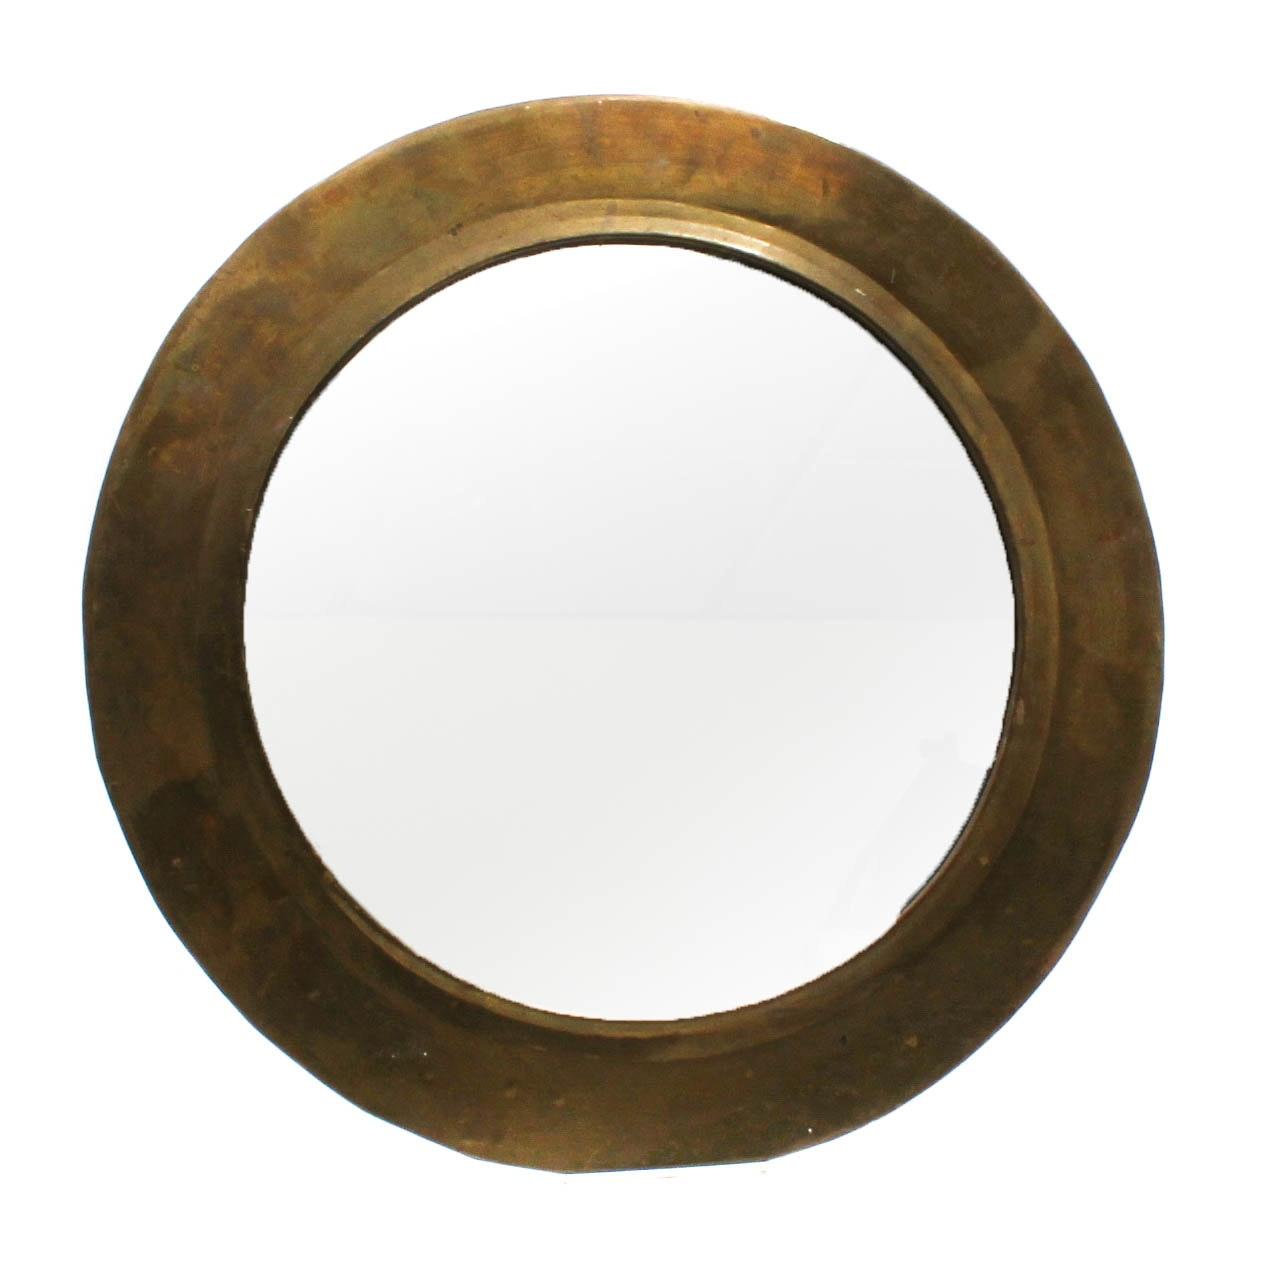 Vintage Handwrought Brass Wall Mirror